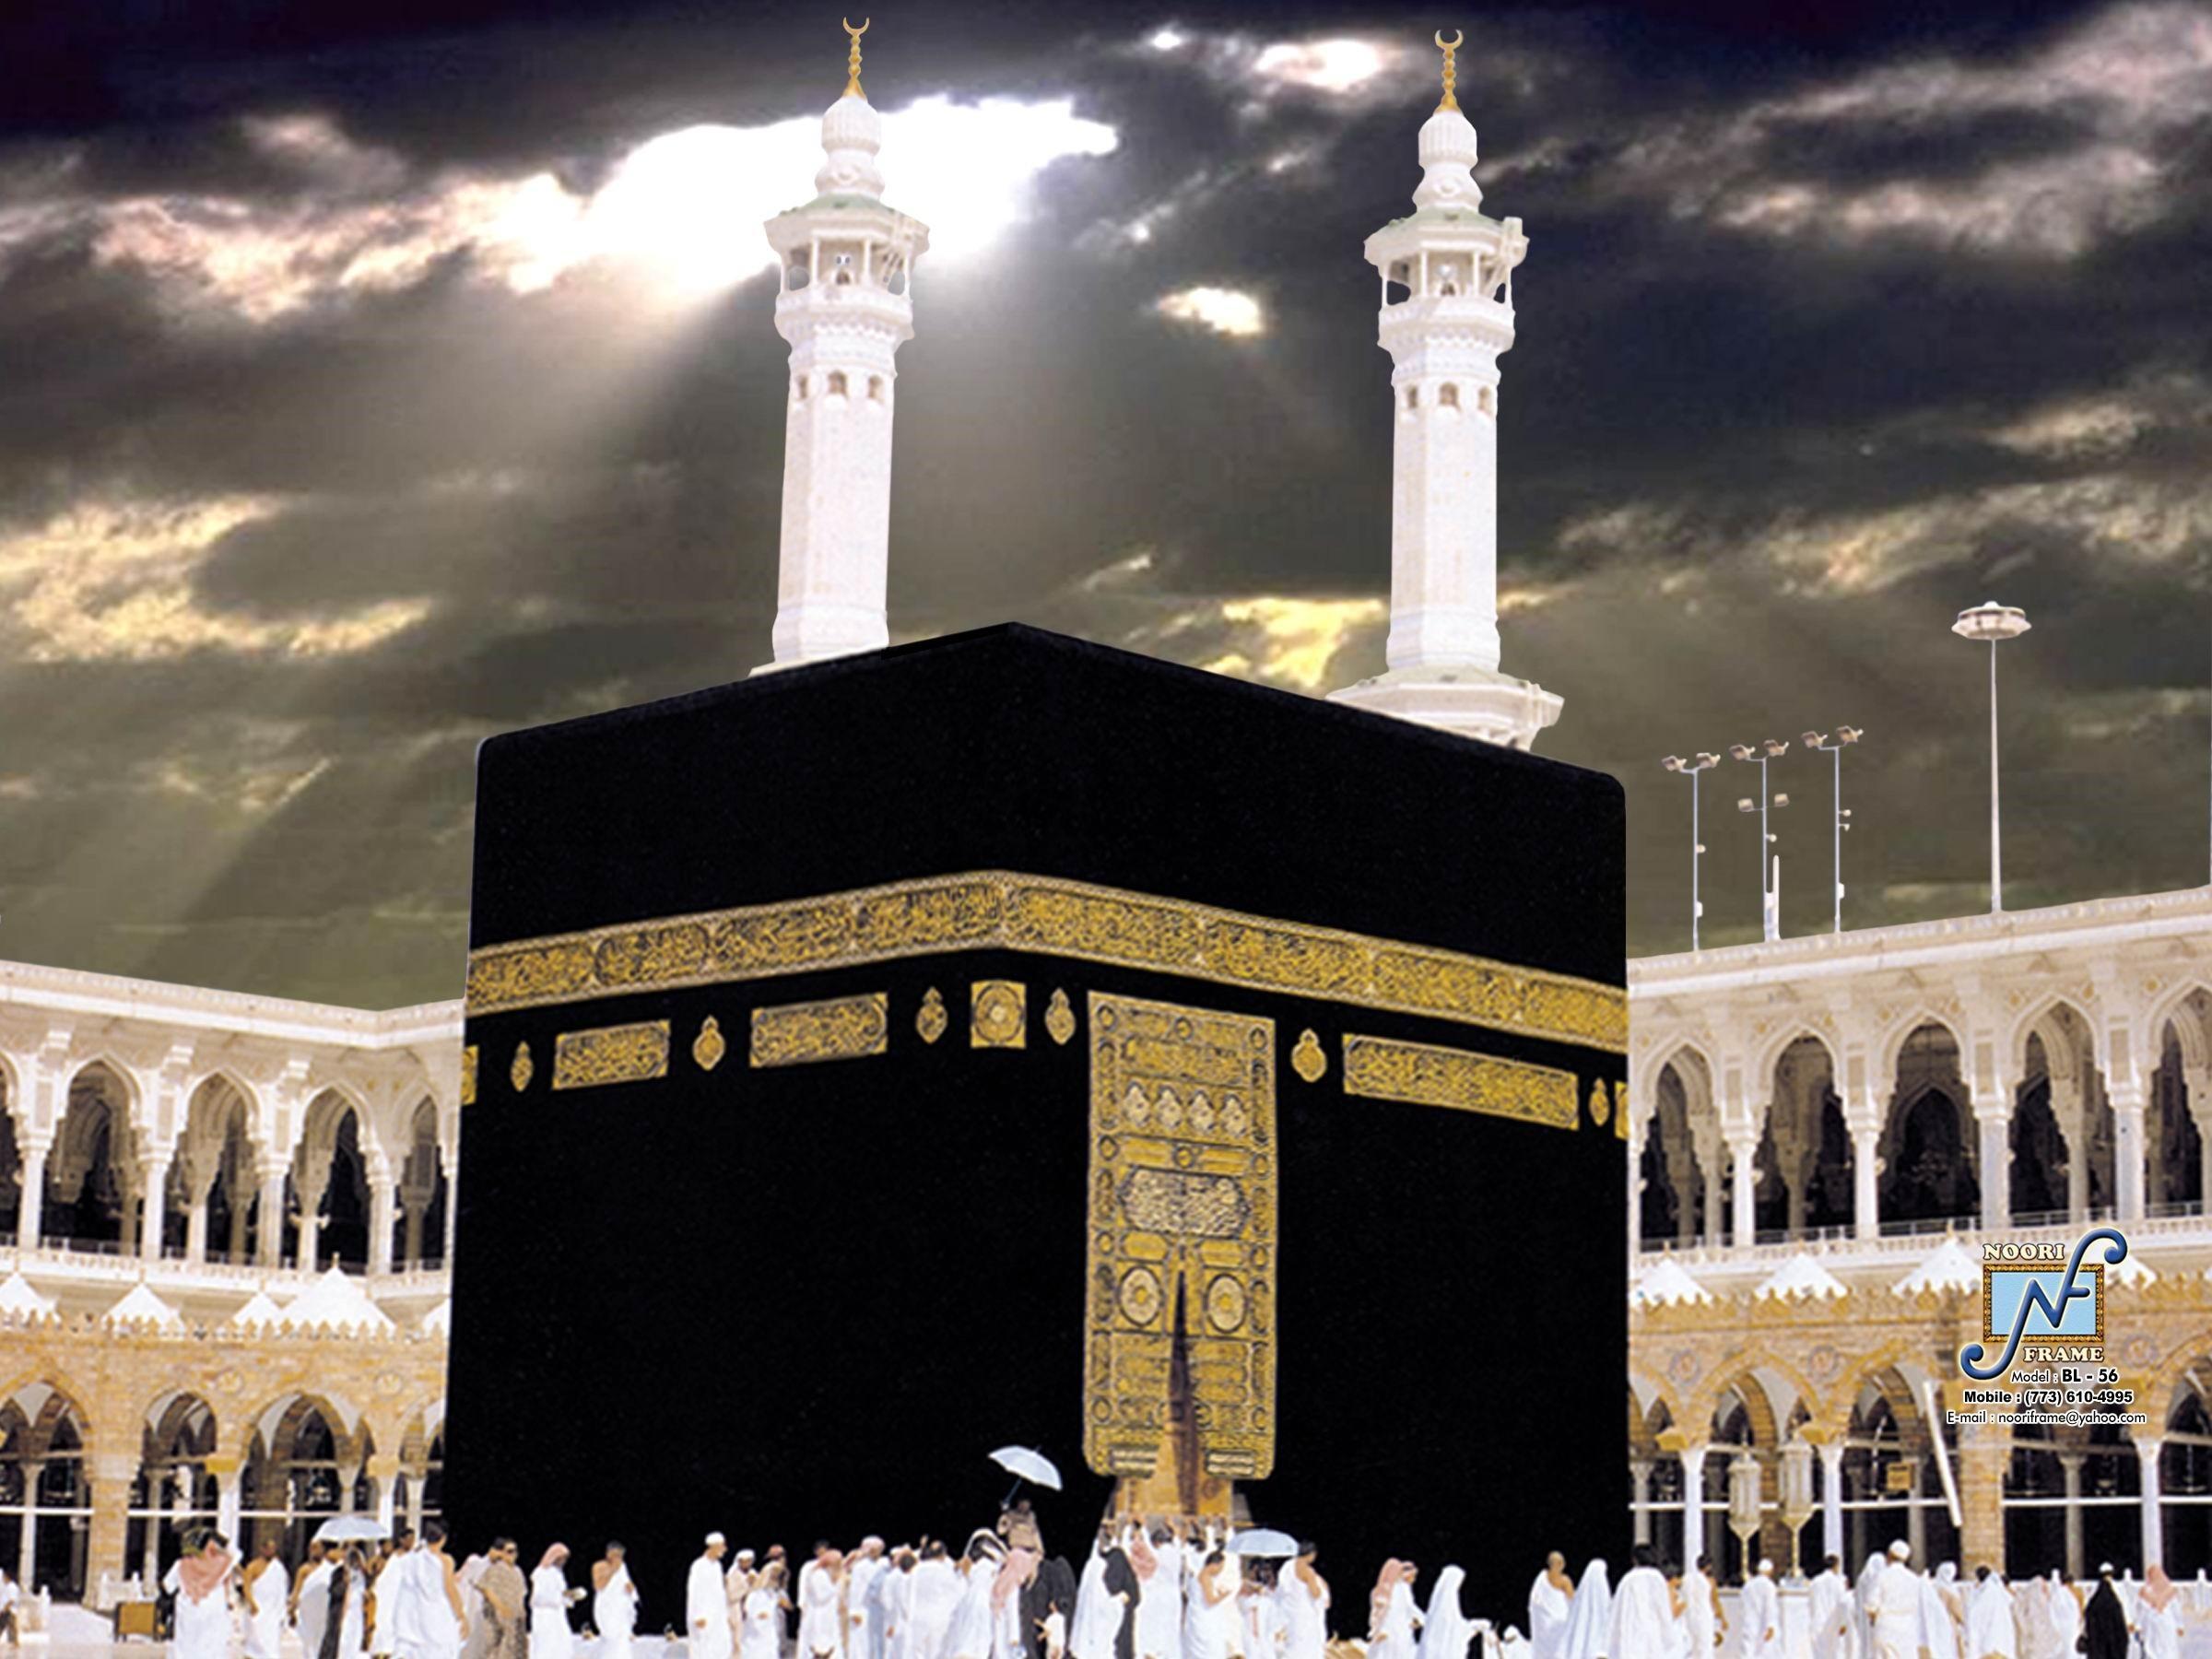 Res: 2400x1800, Makkah-hd-wallpaper-3.jpg